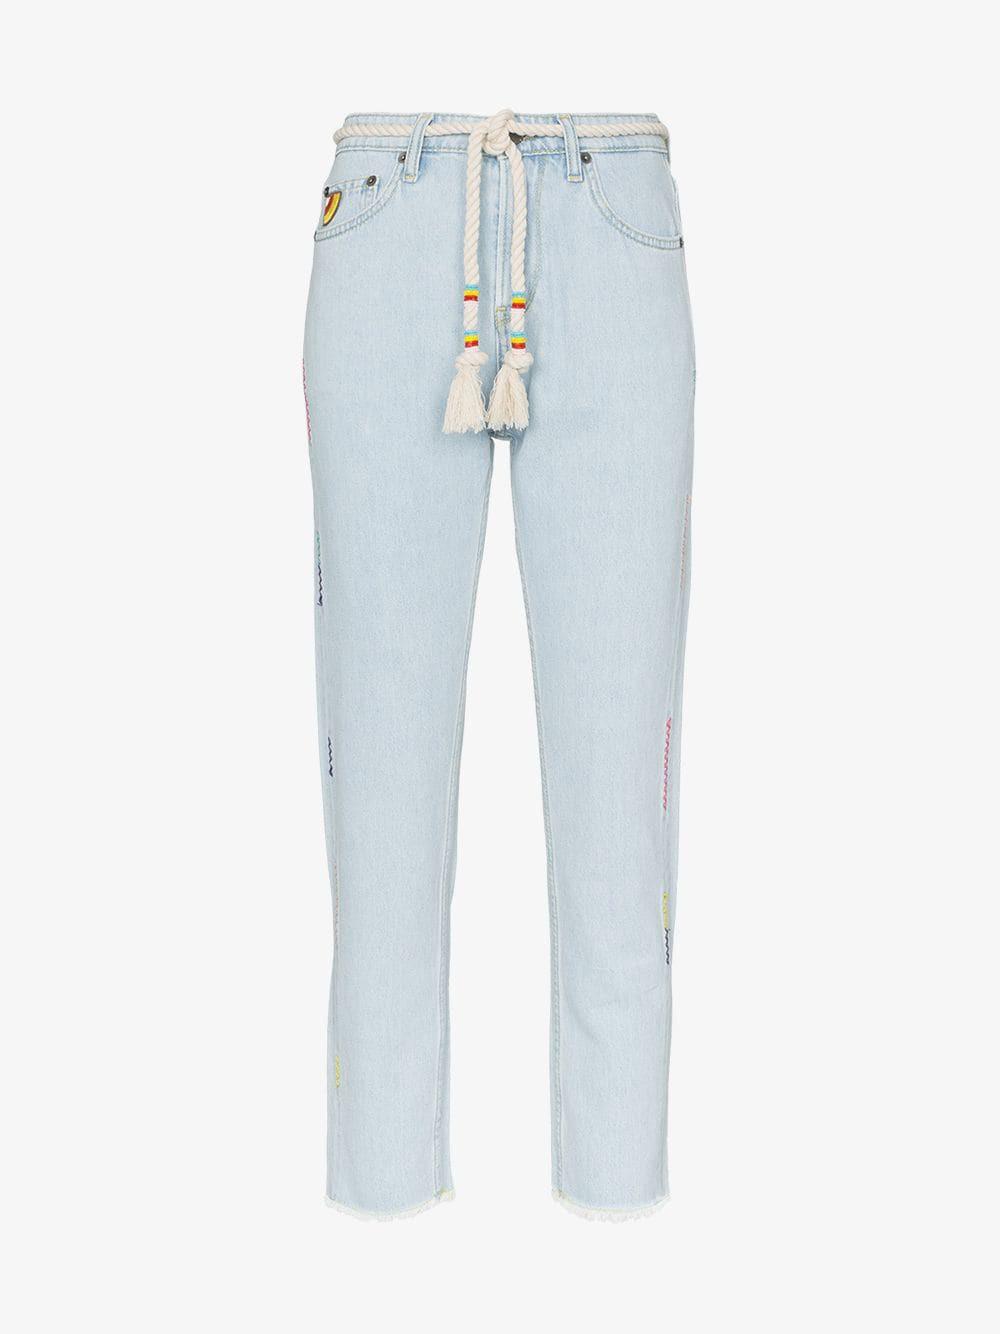 Mira Mikati rope belt cropped jeans in blue